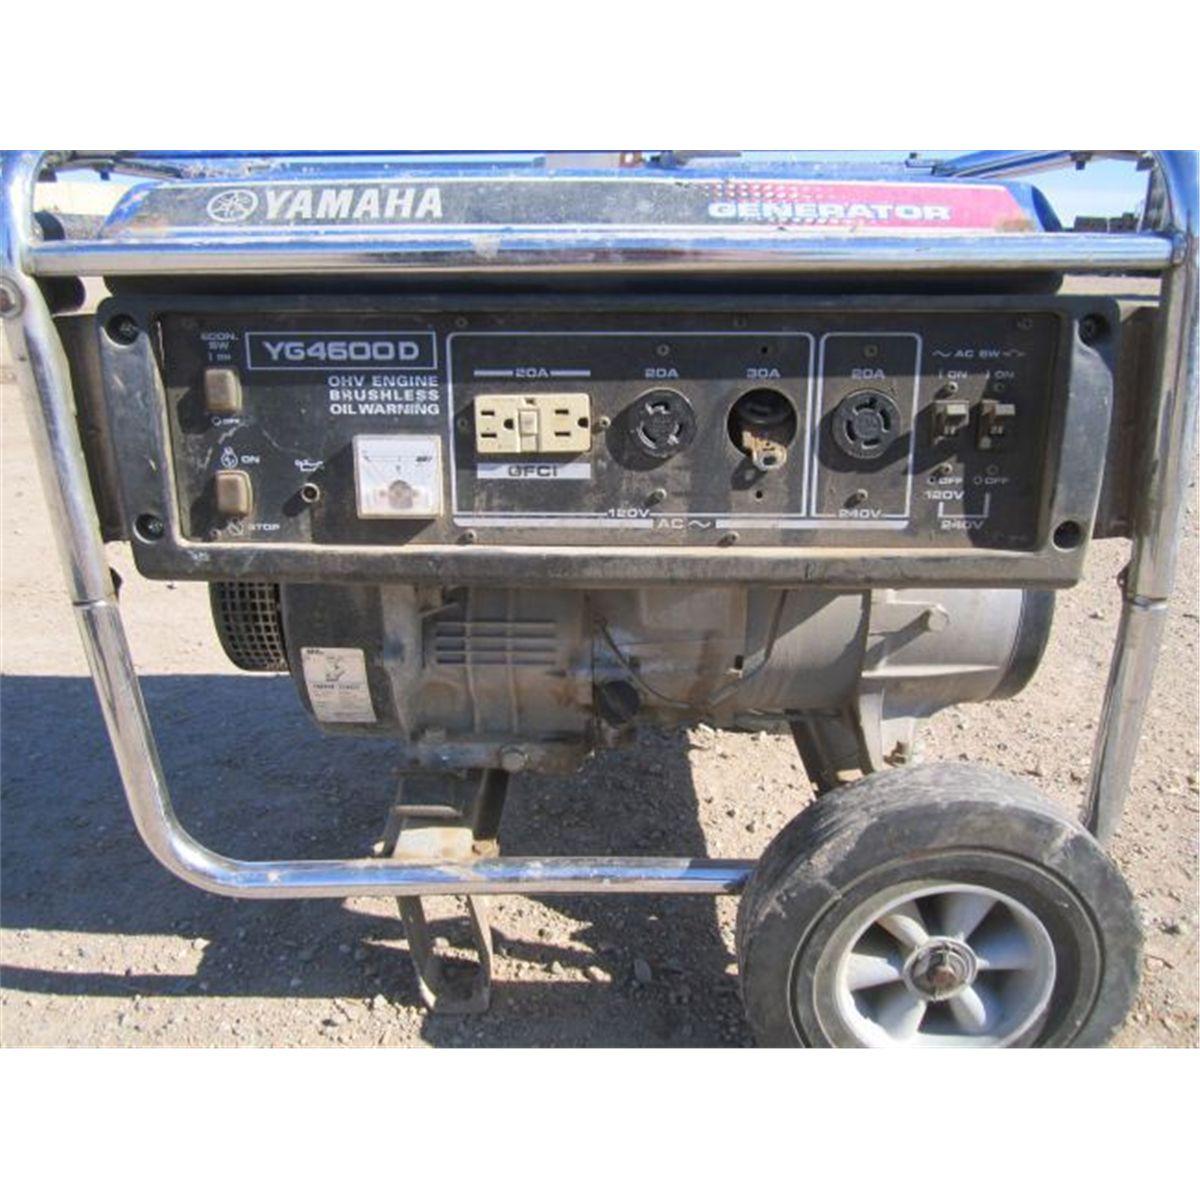 Yamaha 4,600w Portable Generator